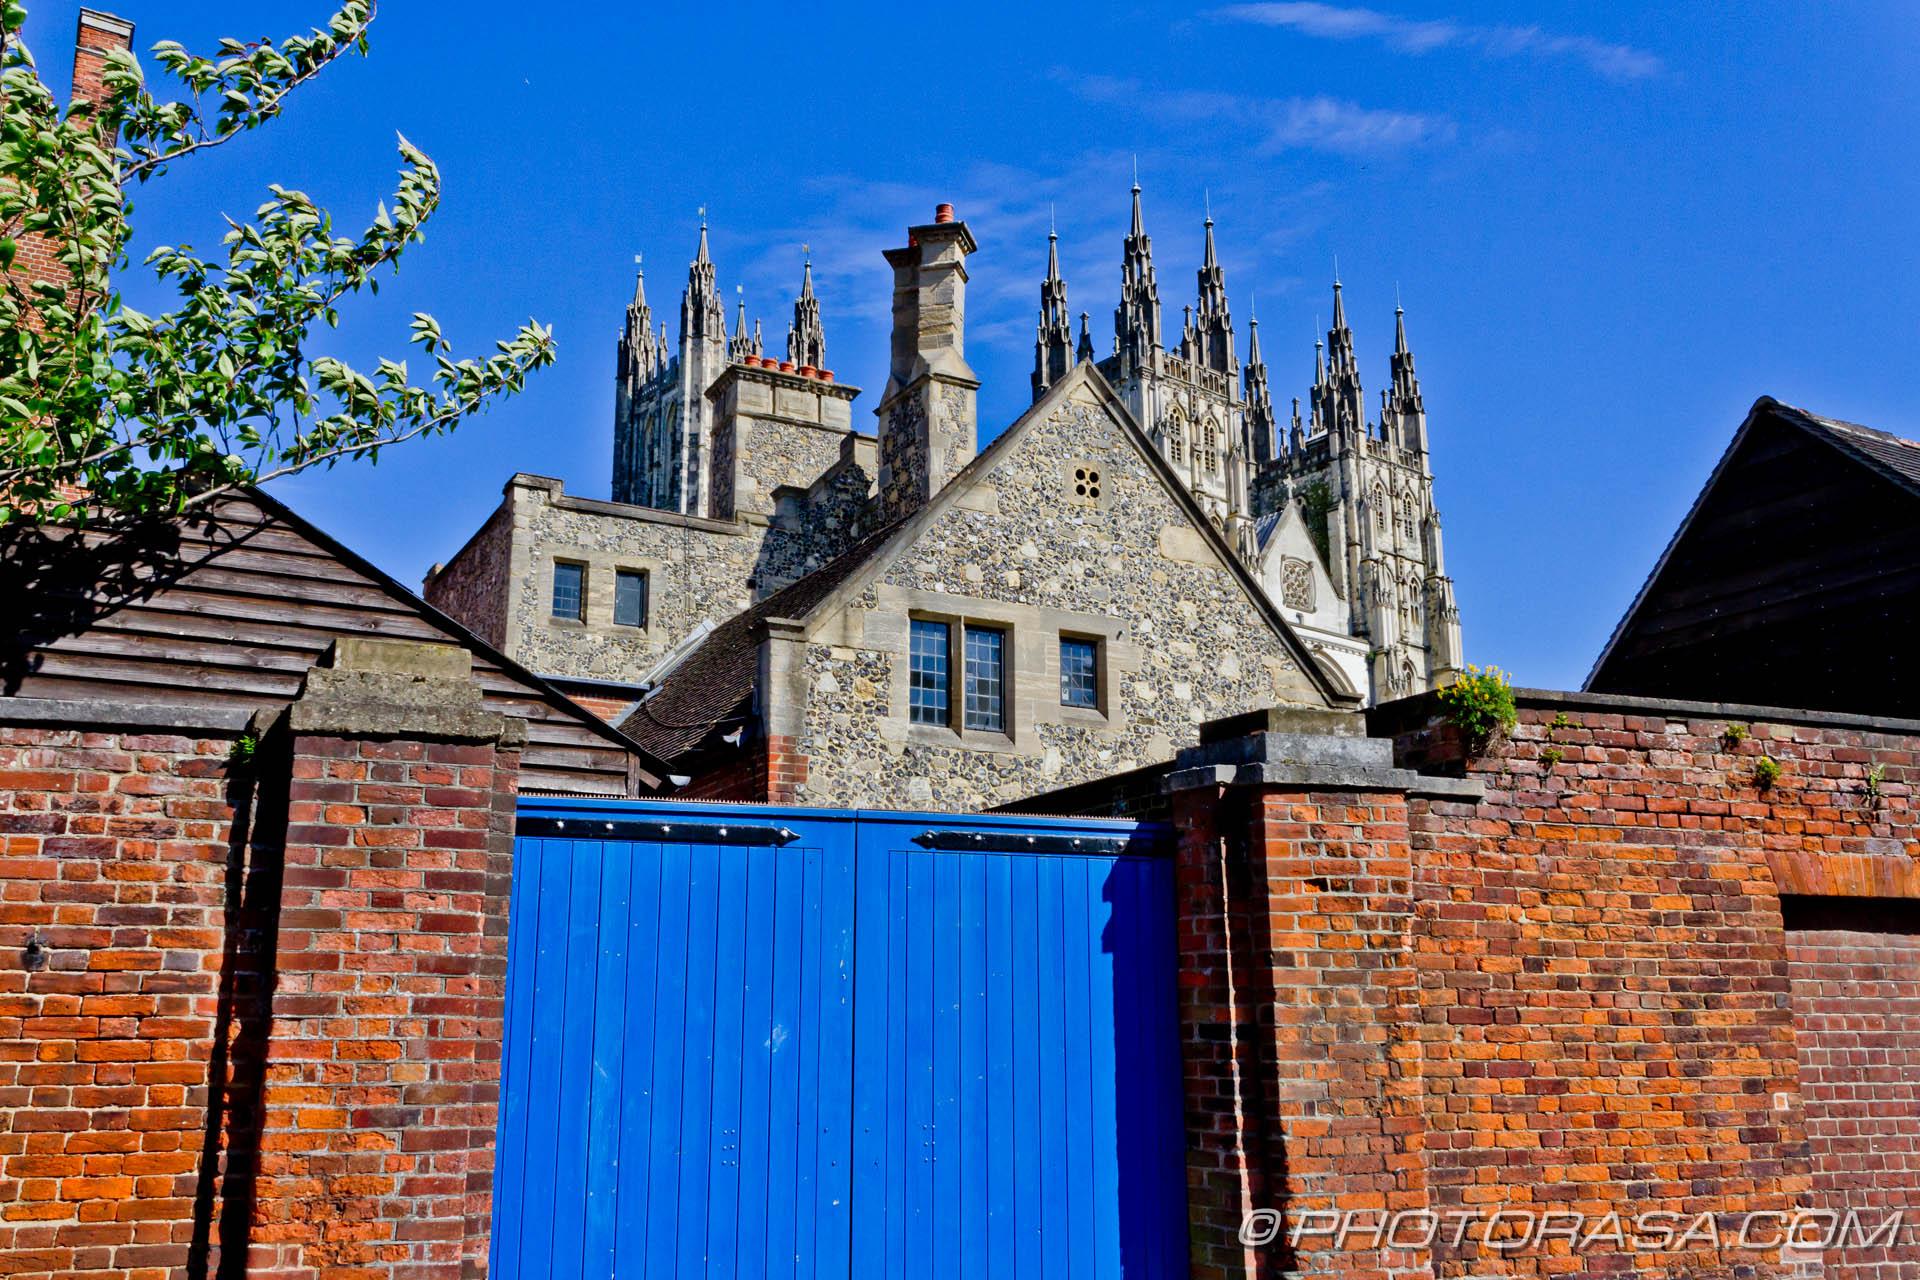 http://photorasa.com/canterbury-trip/behind-the-blue-gate/